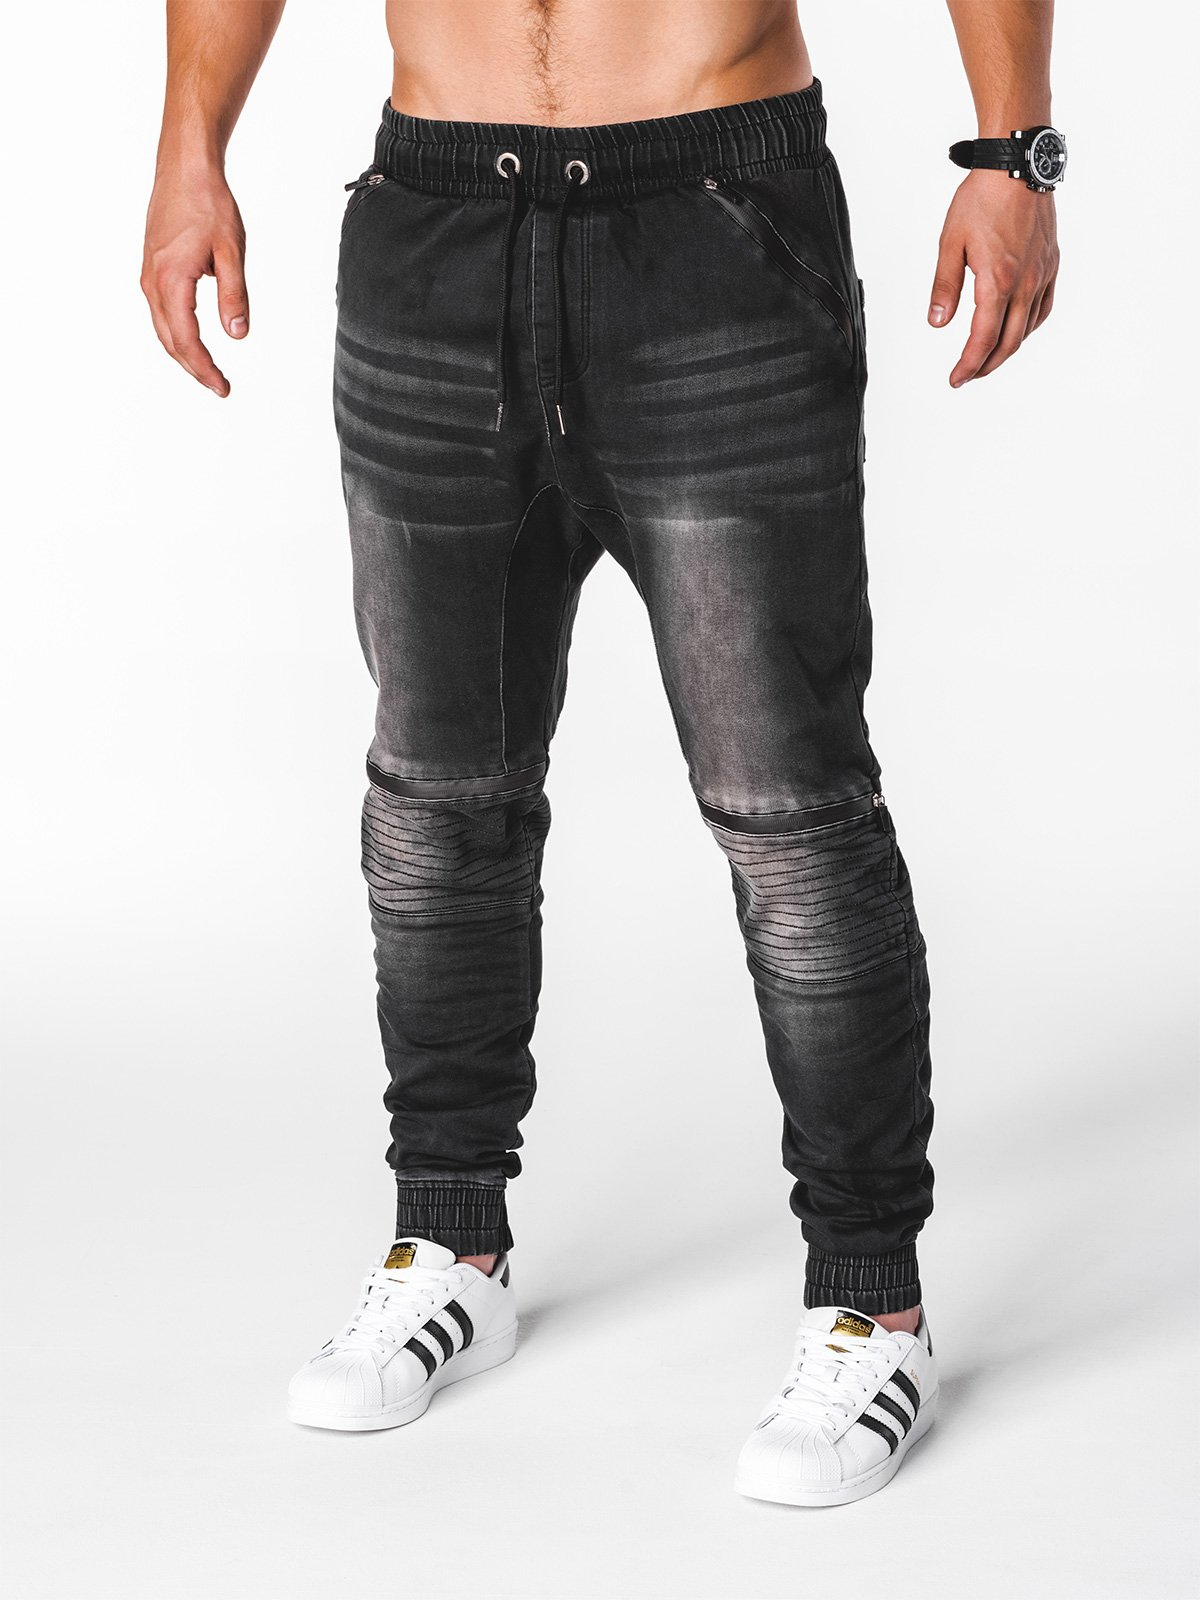 Ombre Clothing Men's jeans joggers P651